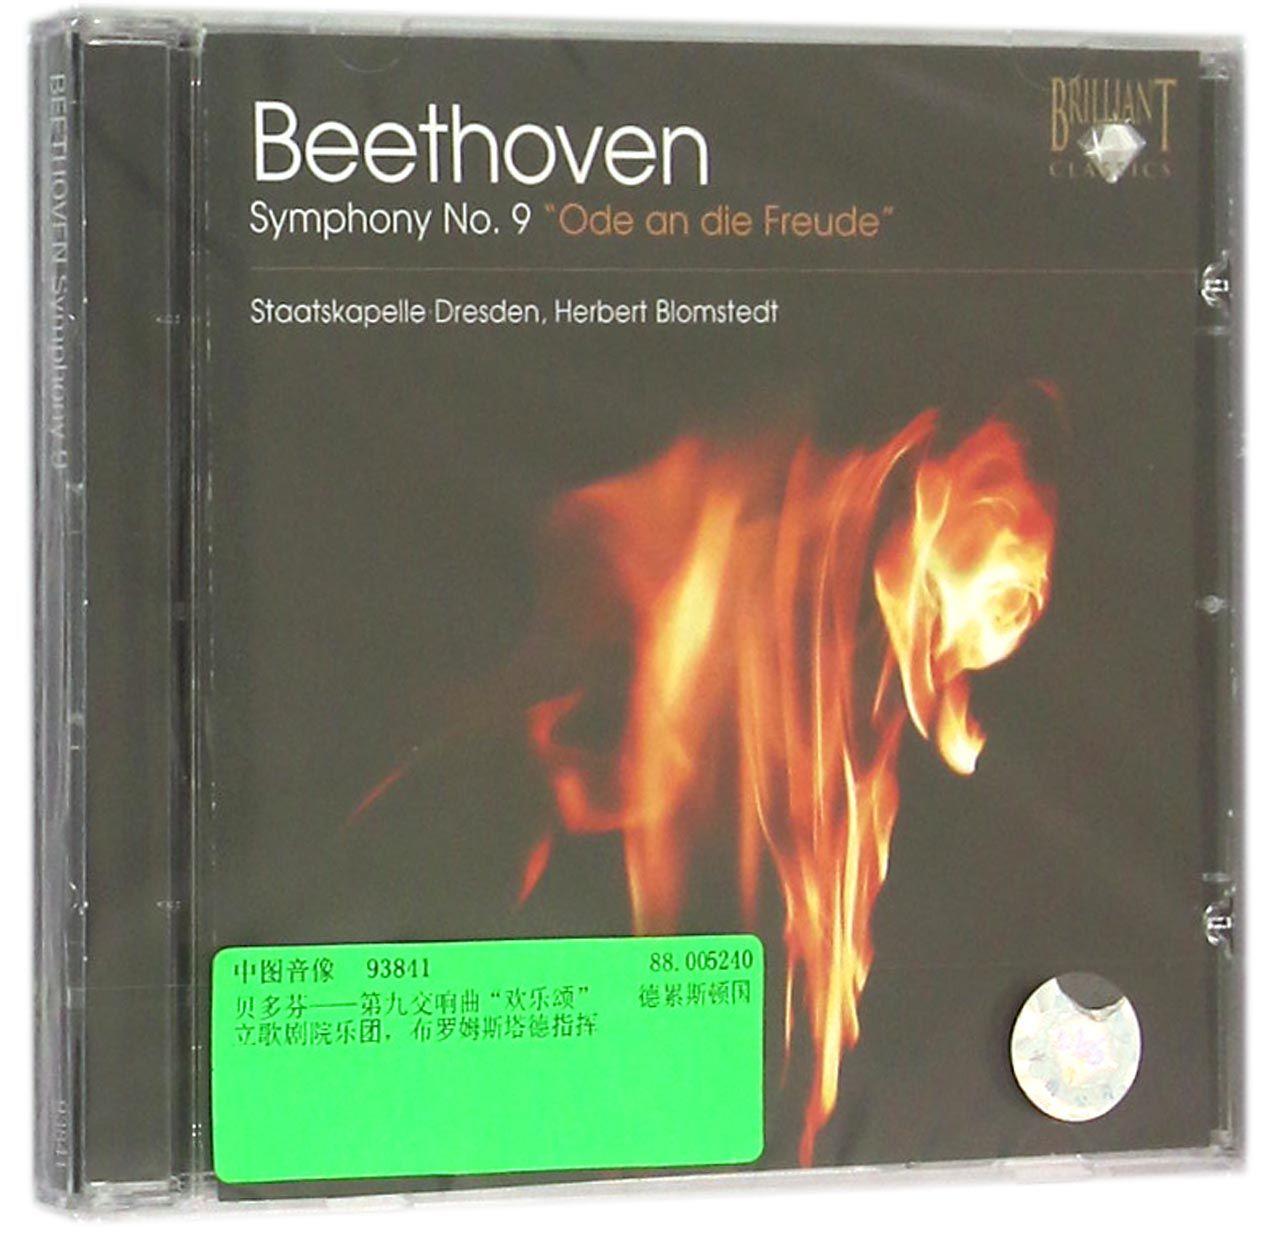 cd贝多芬第九交响曲欢乐颂